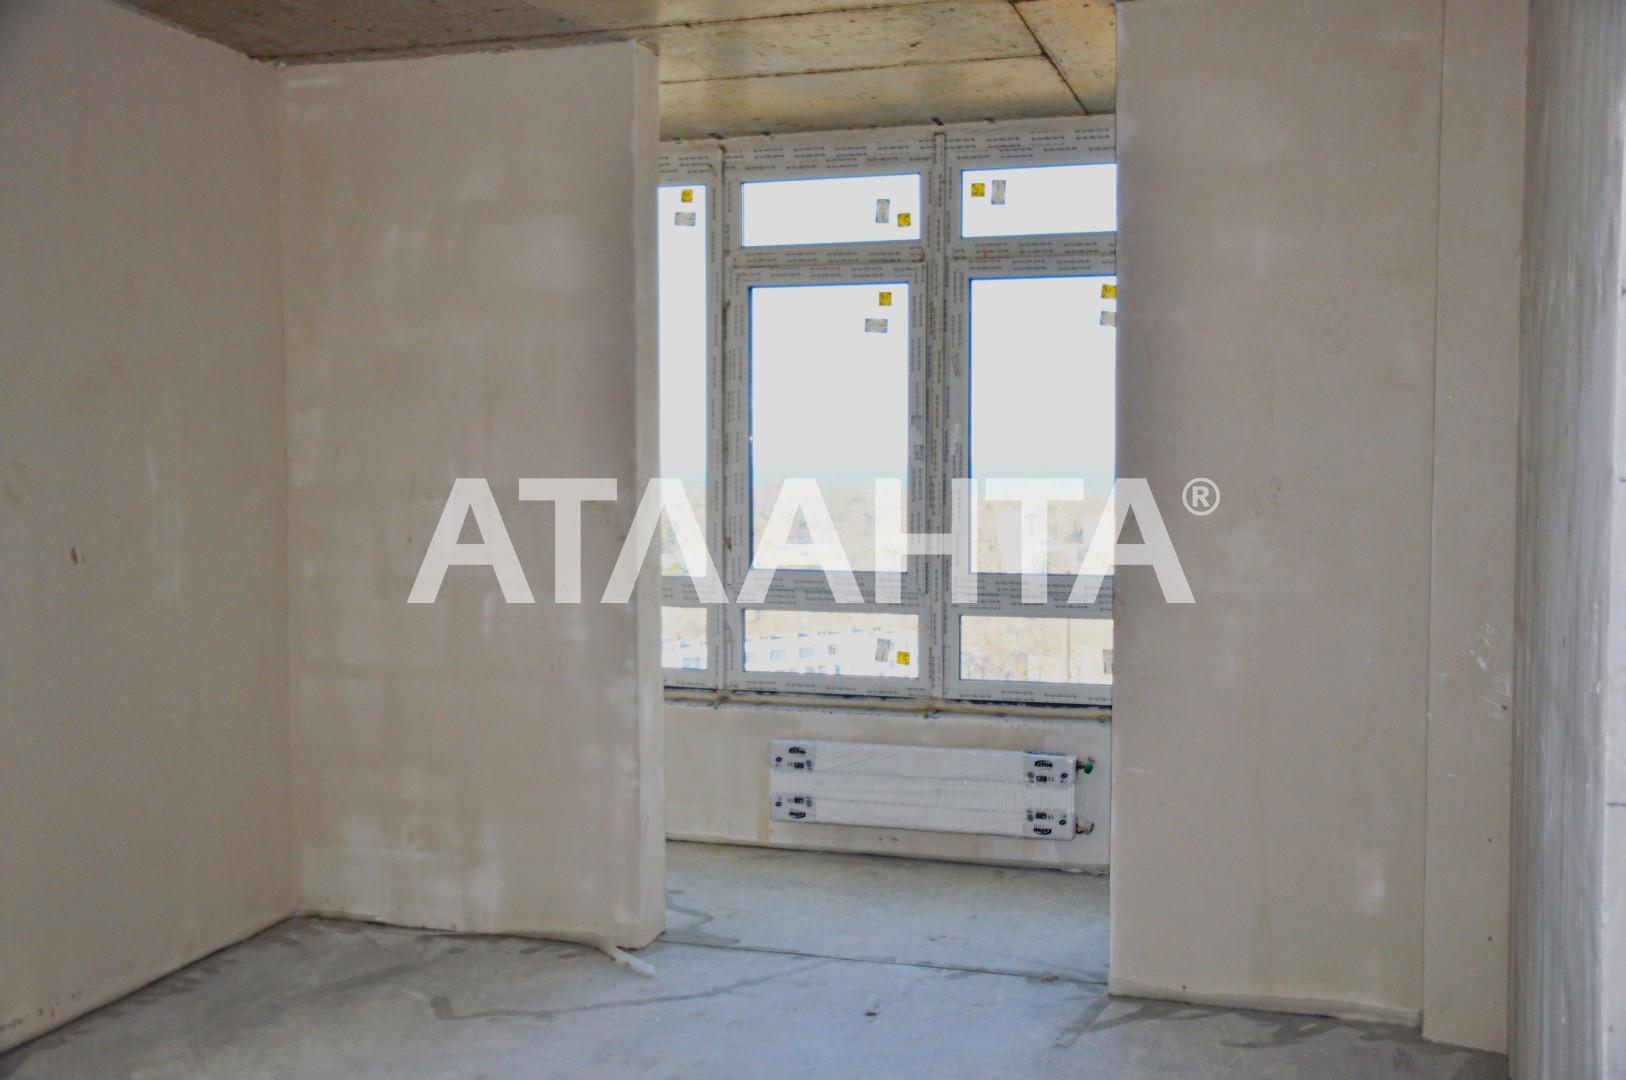 Продается 1-комнатная Квартира на ул. Генуэзская — 45 500 у.е. (фото №3)